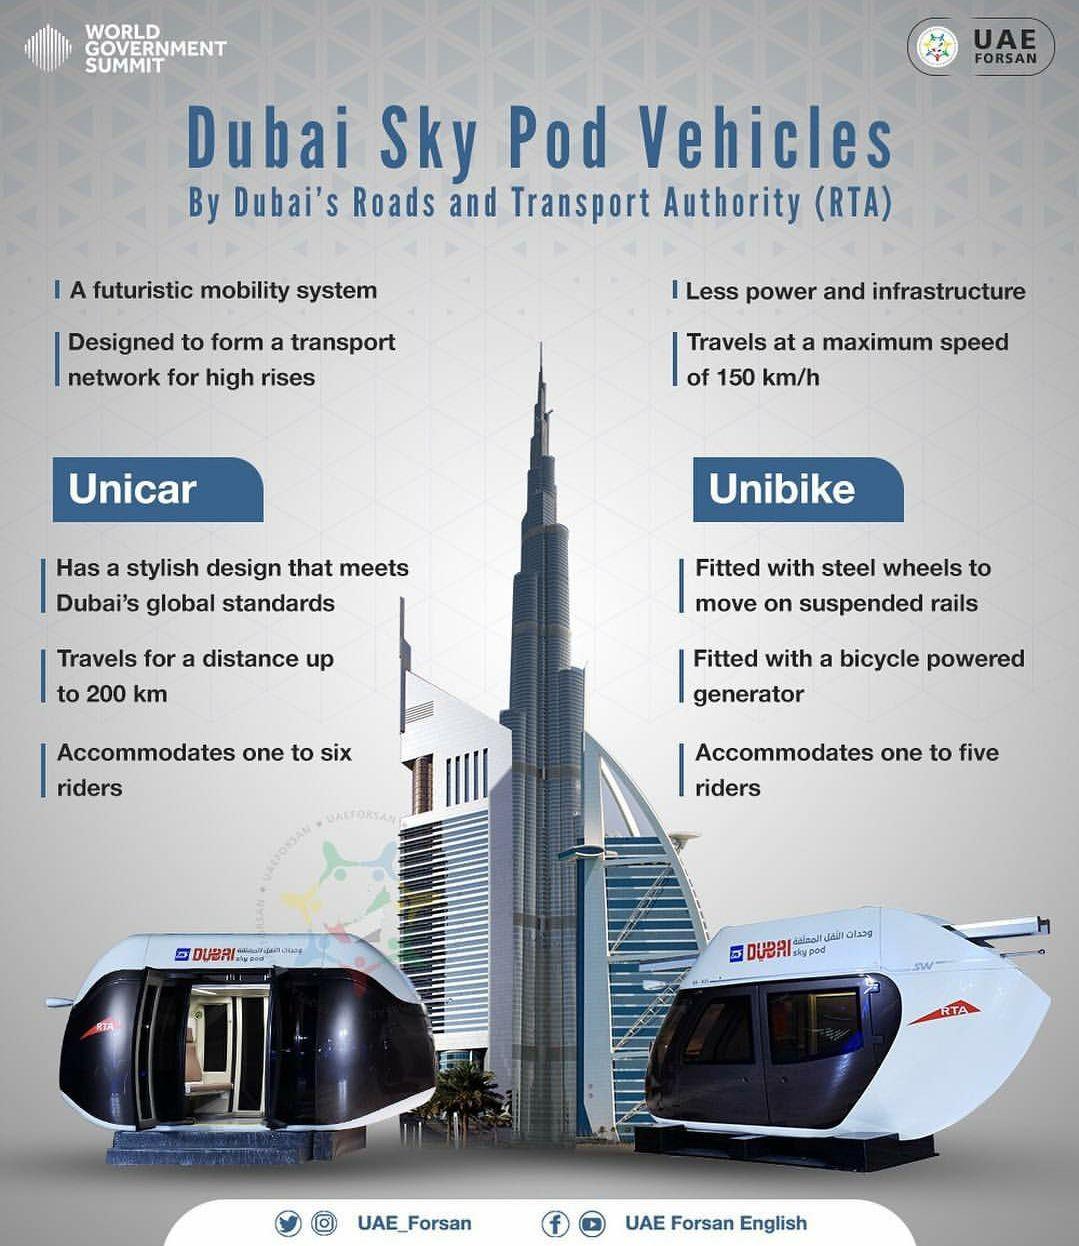 dubai-sky-pod-vehicles